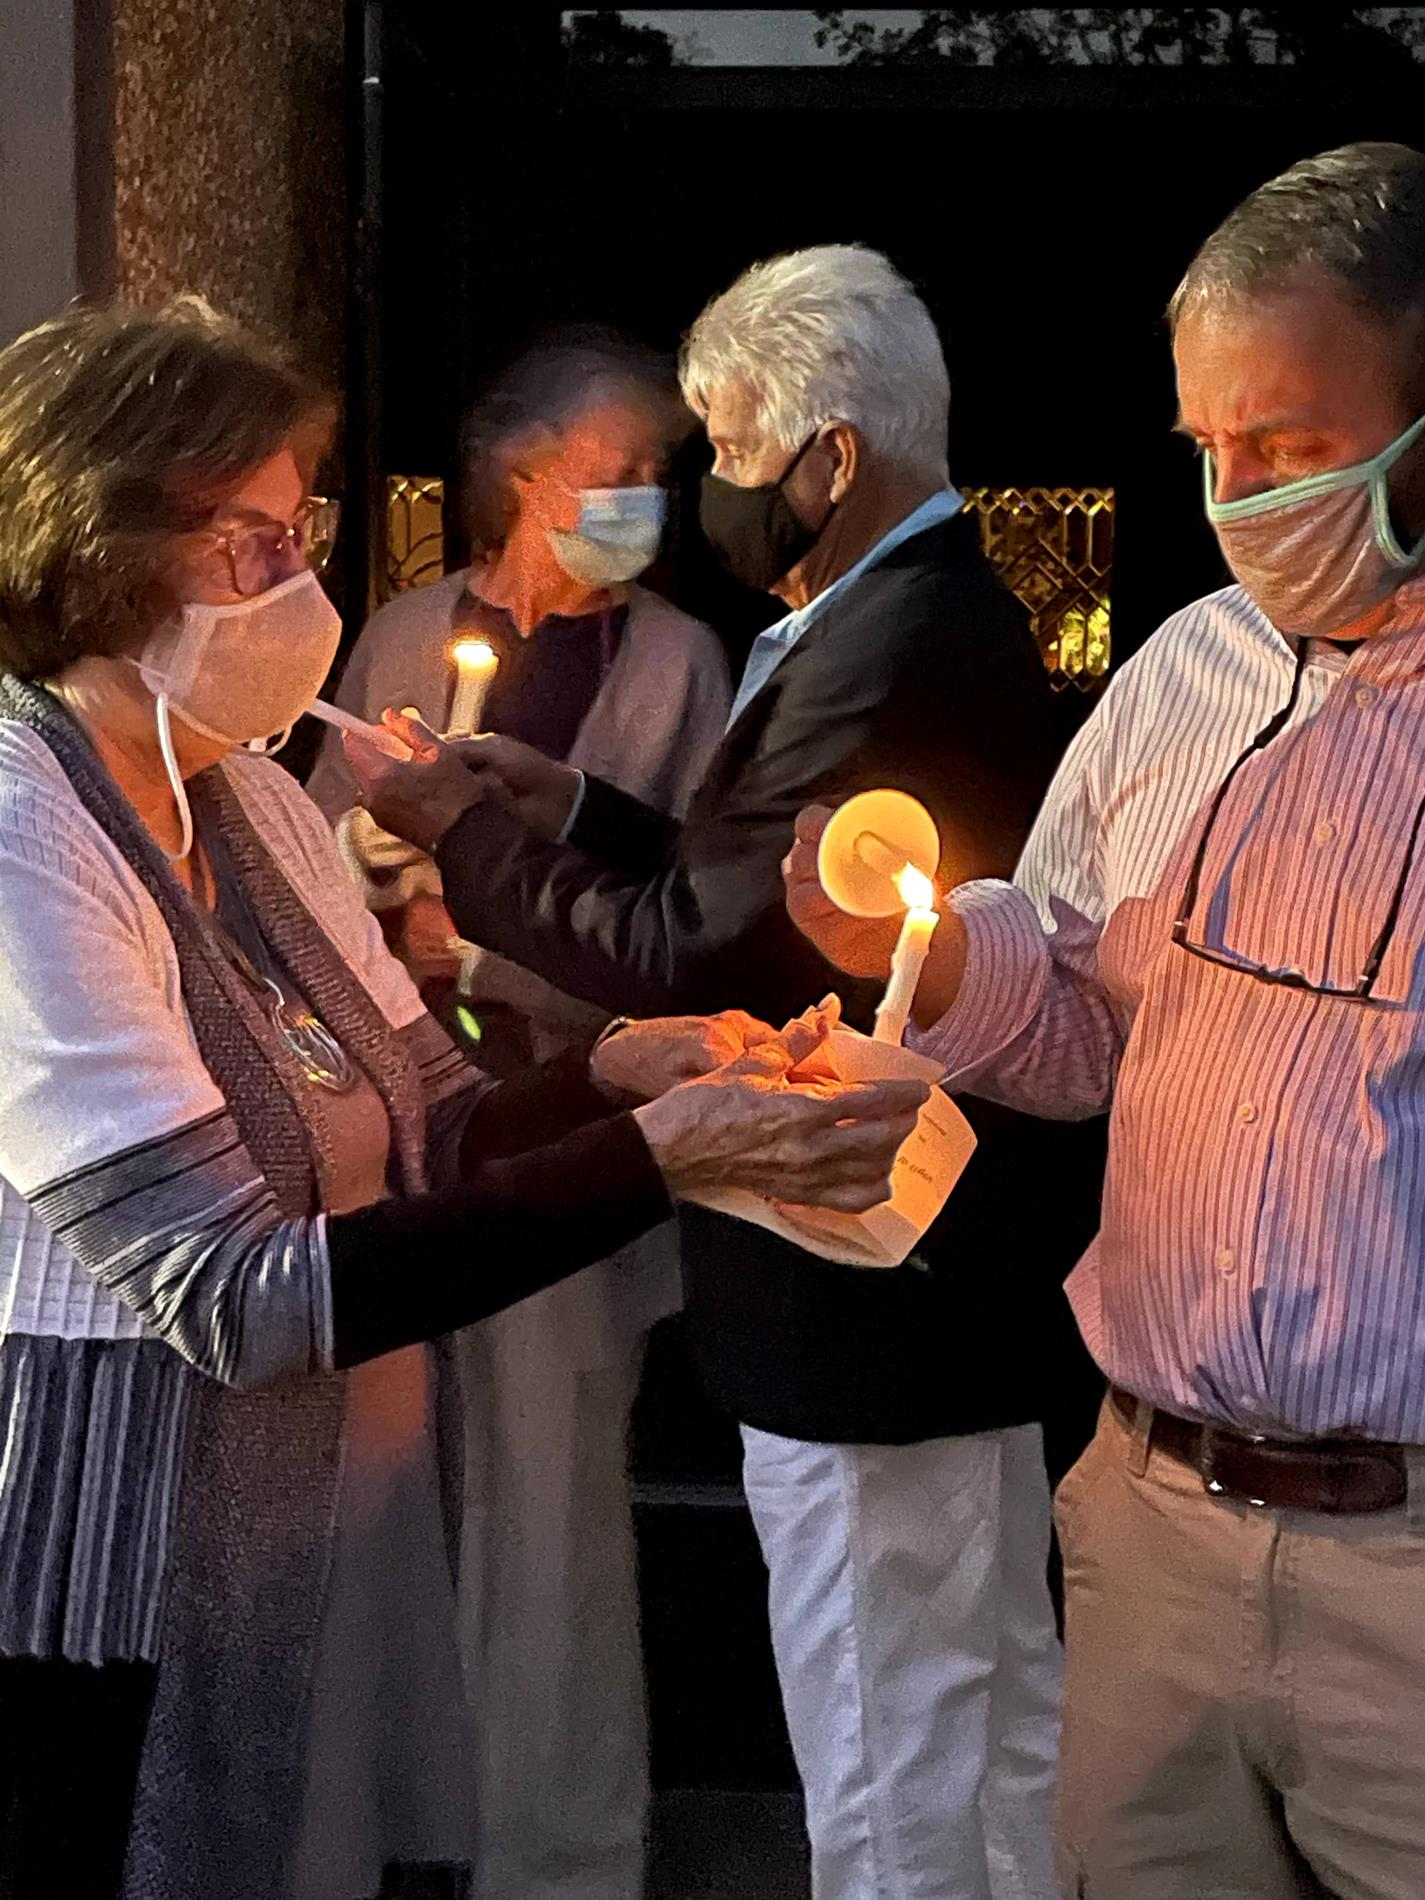 Sharing the Light of Christ